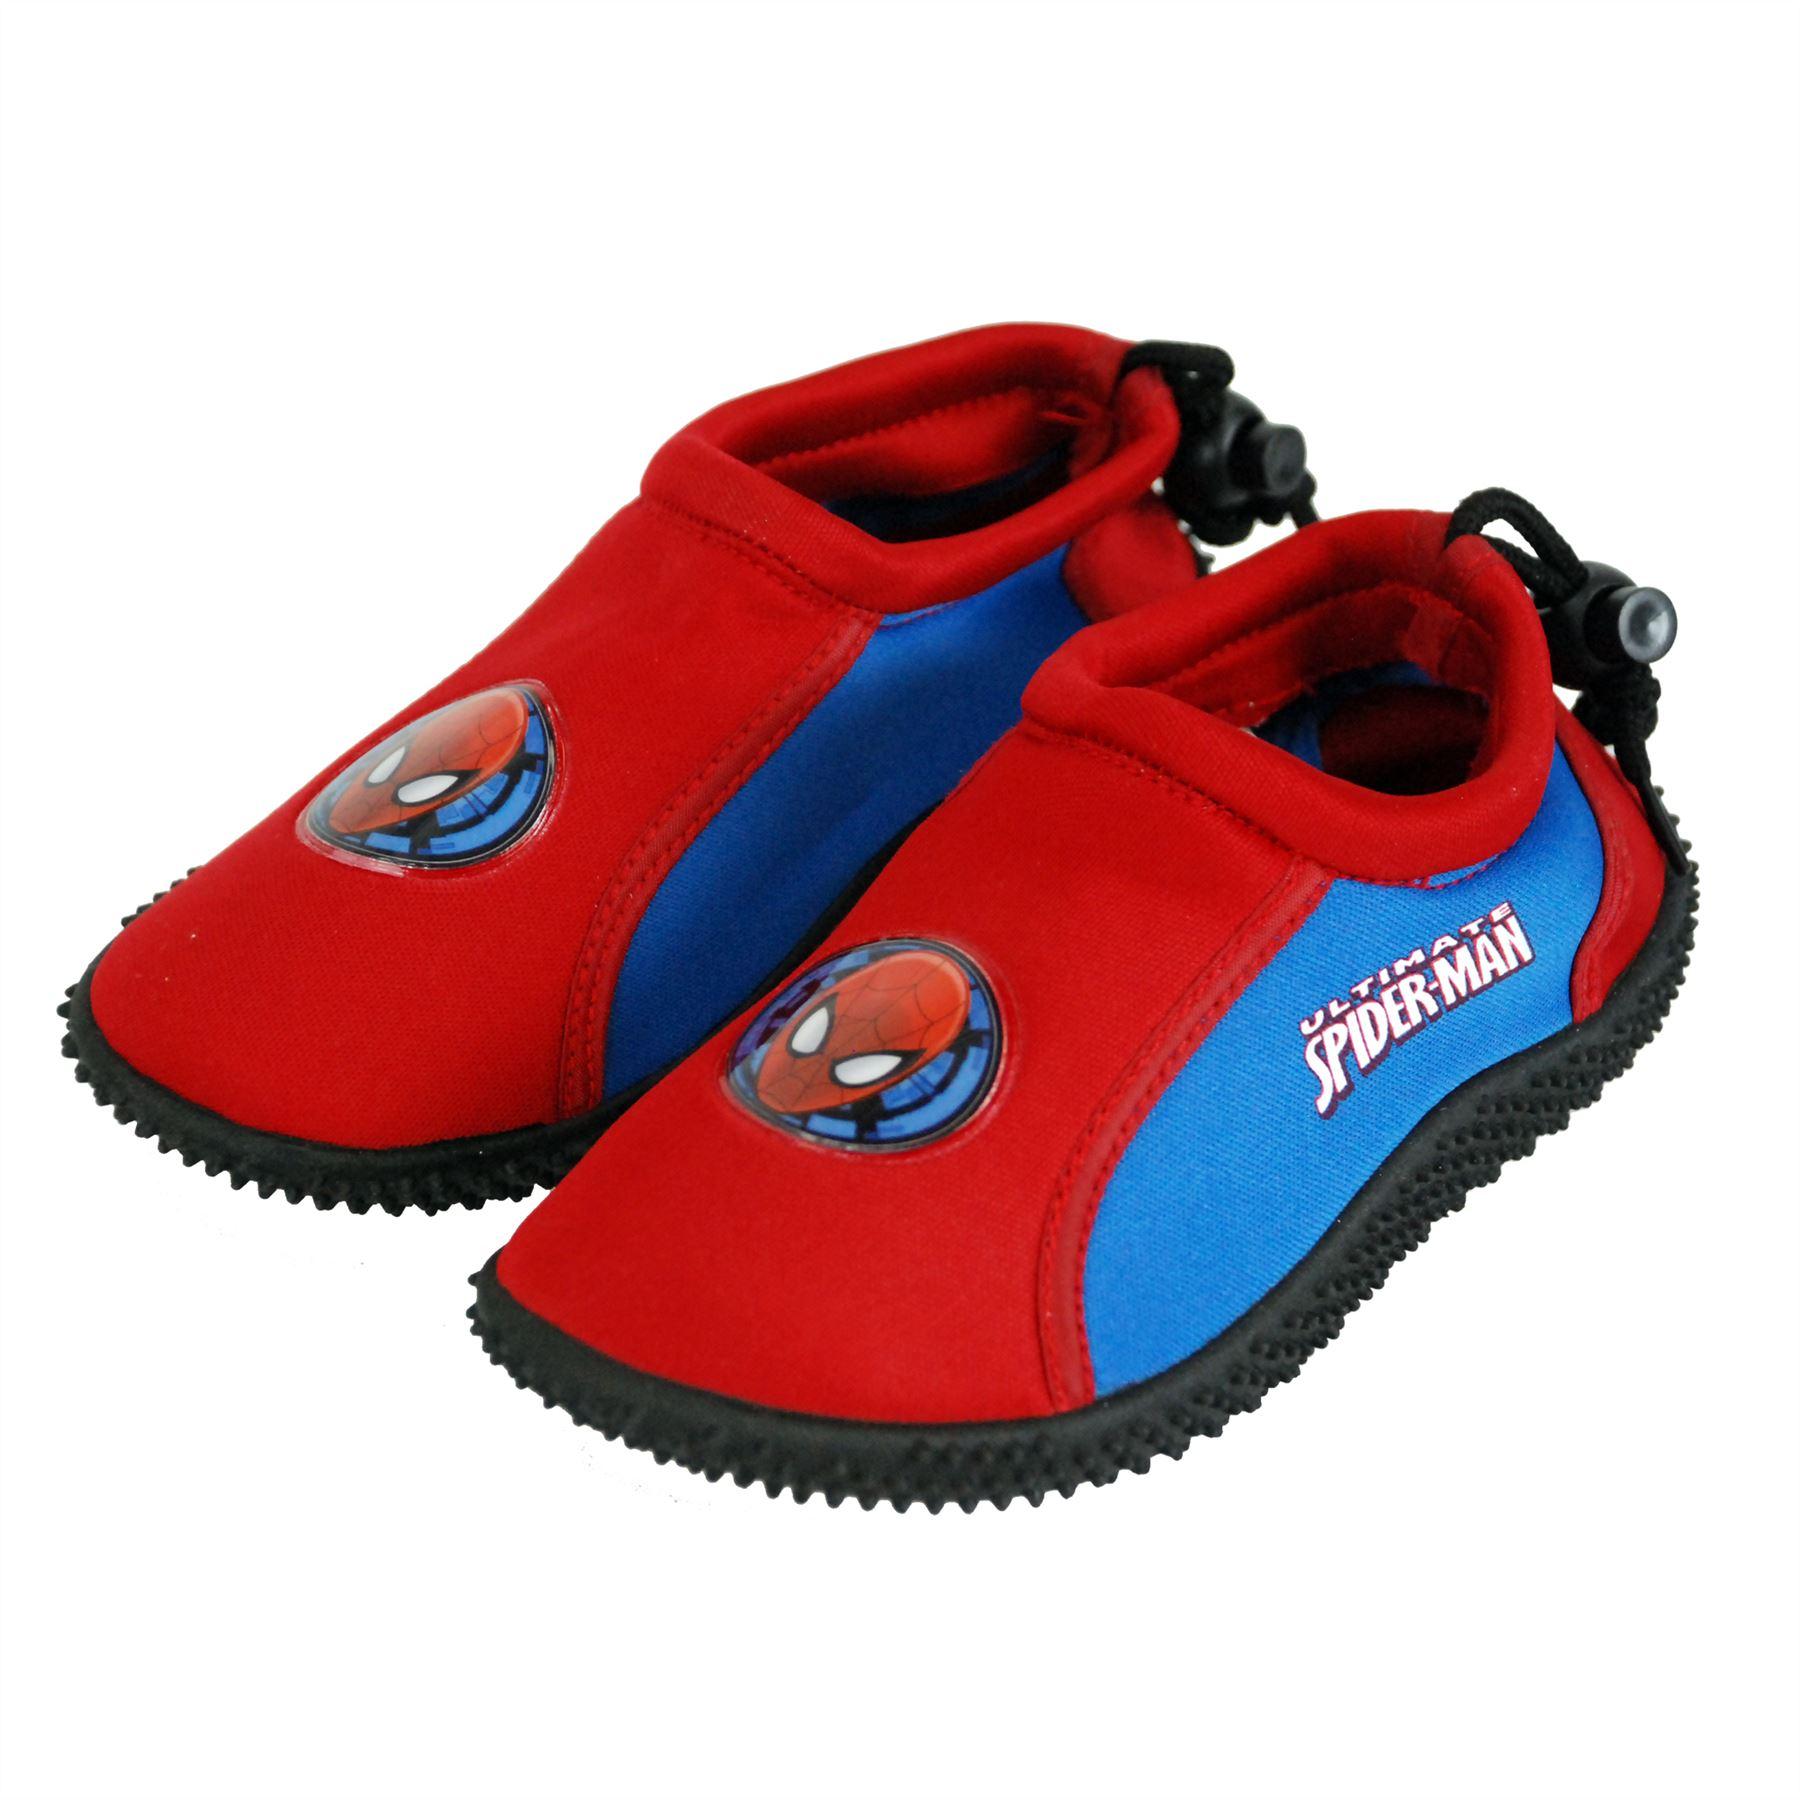 04257061f6b Marvel® Official Spiderman Boys Surf Aqua Shoes for Beach